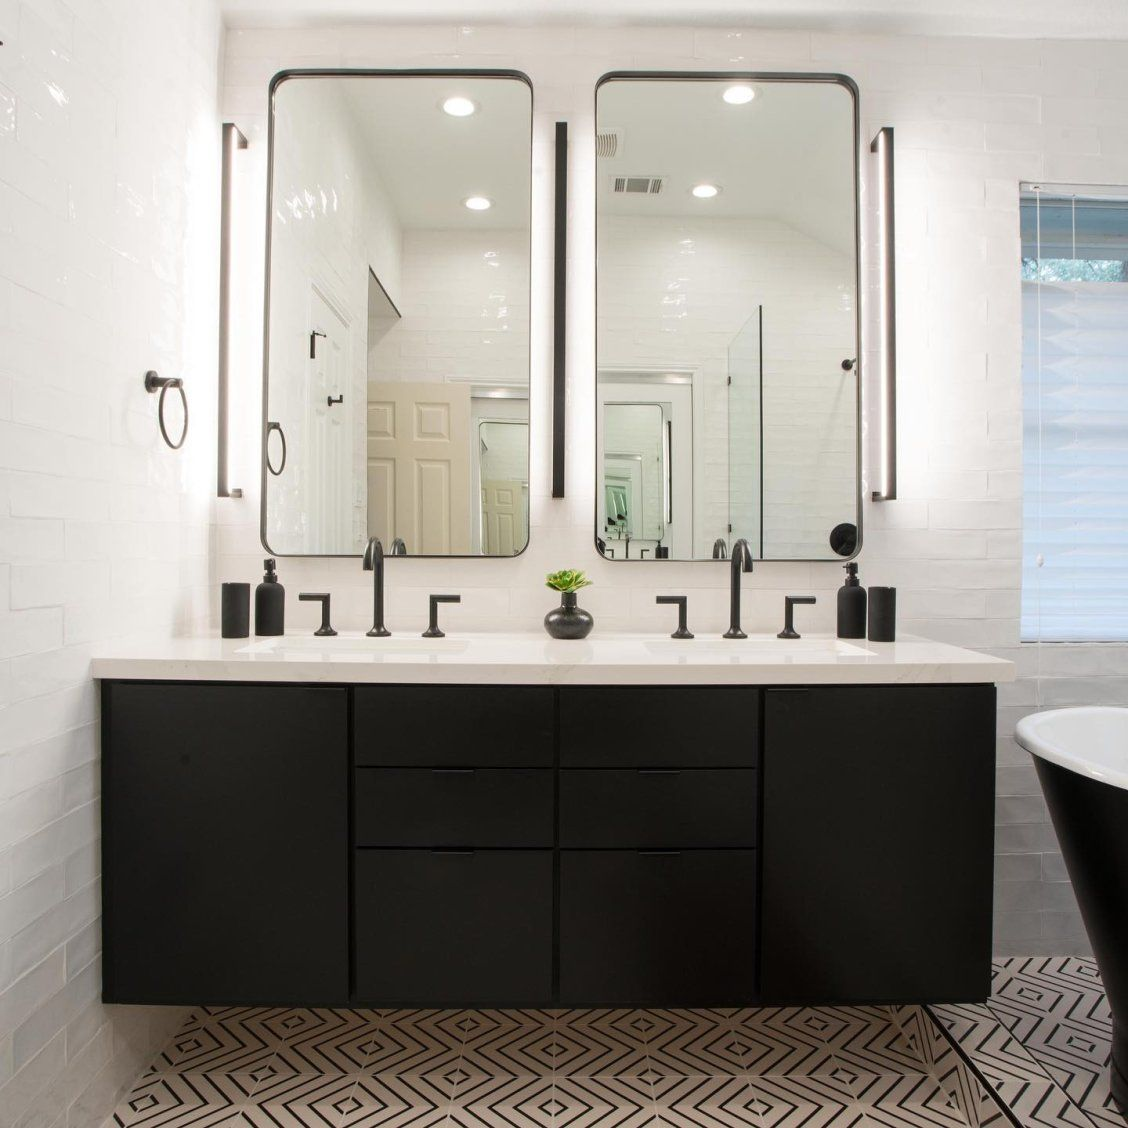 Thin Line Led Wall Bar Master Bathroom Vanity Bathroom Styling Cottage Style Bathrooms